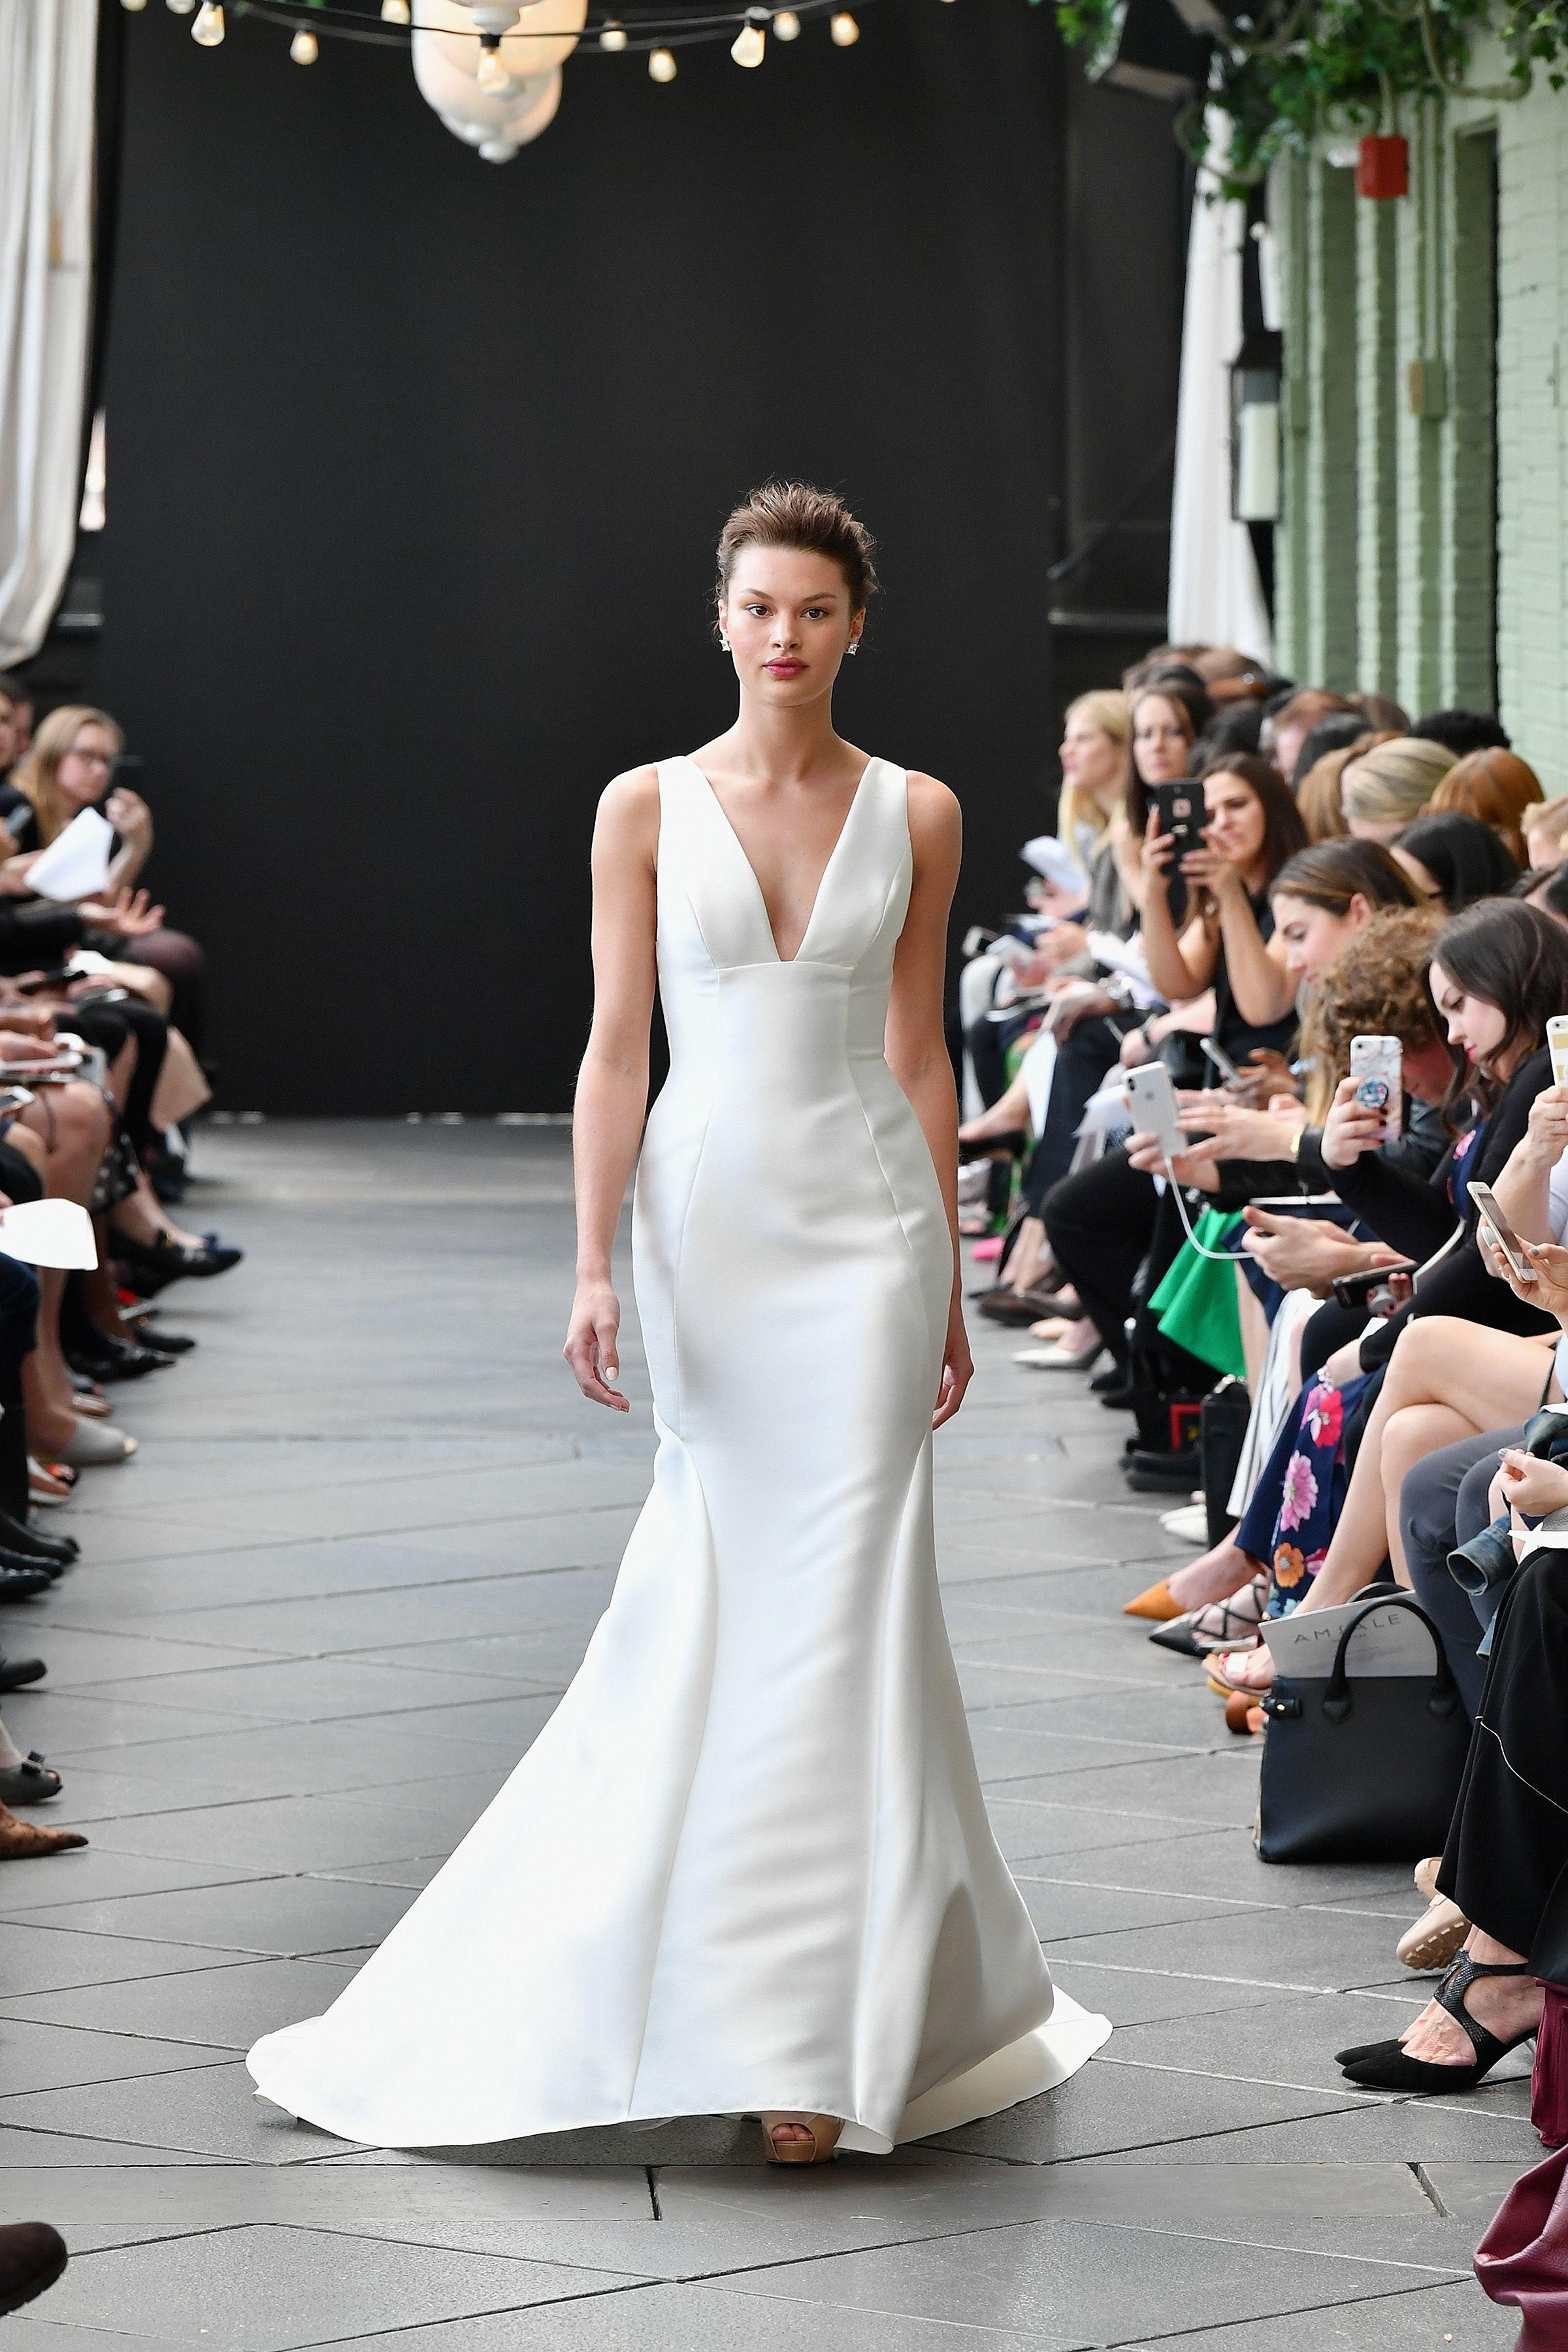 Lydia Wedding Dress By Nouvelle Amsale Bridal Amsale Wedding Dress Amsale Bridal Wedding Dress Inspiration